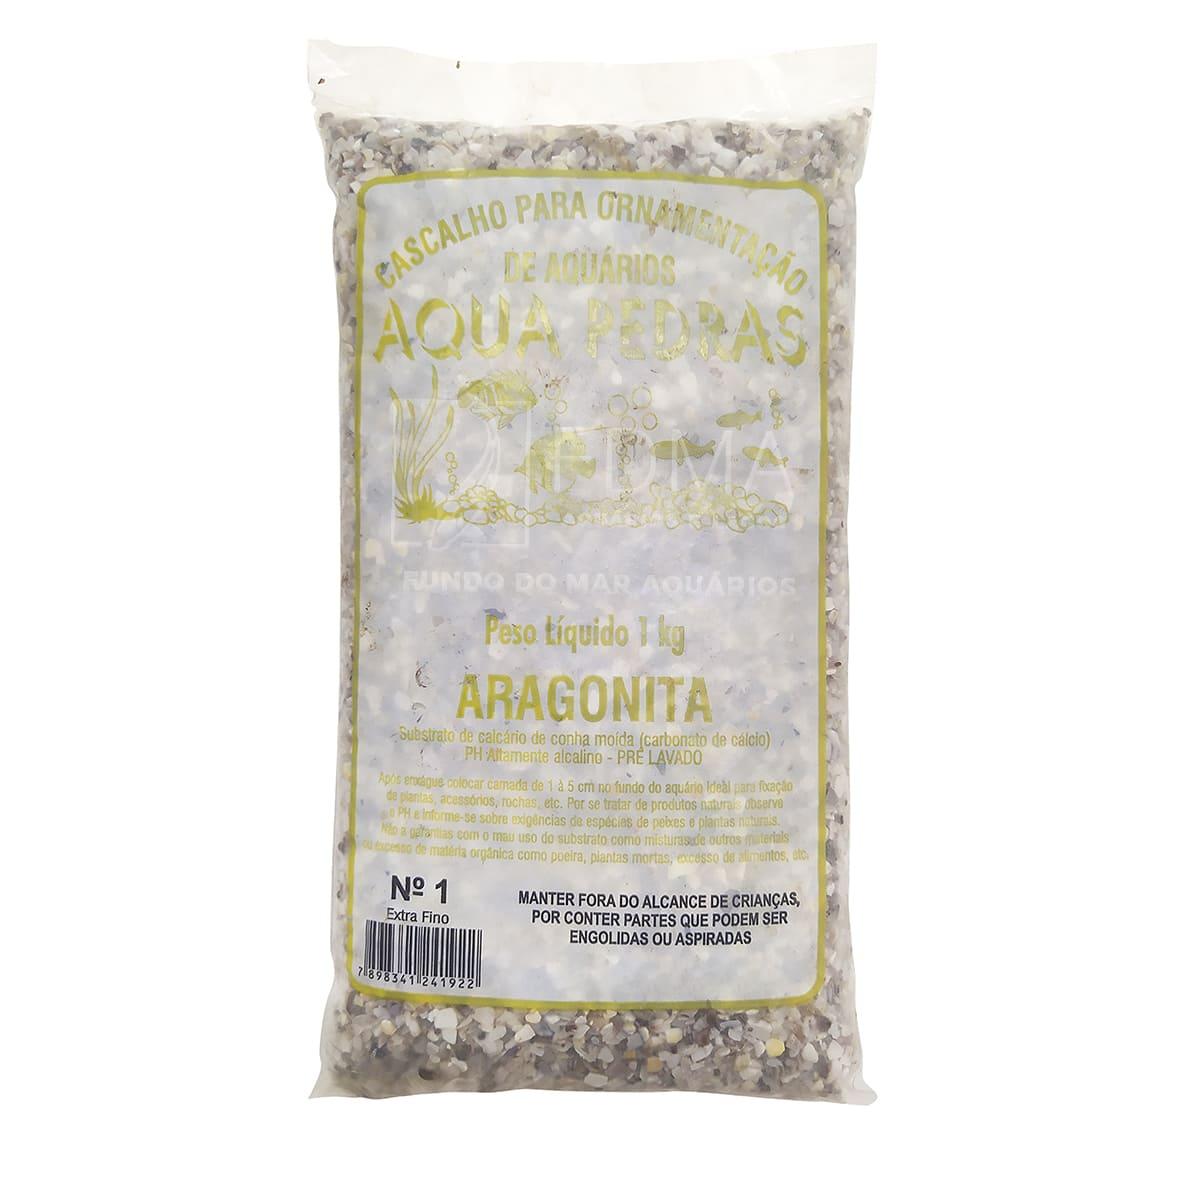 Substrato Aragonita para Aquários e Jardins N°1 - 1kg